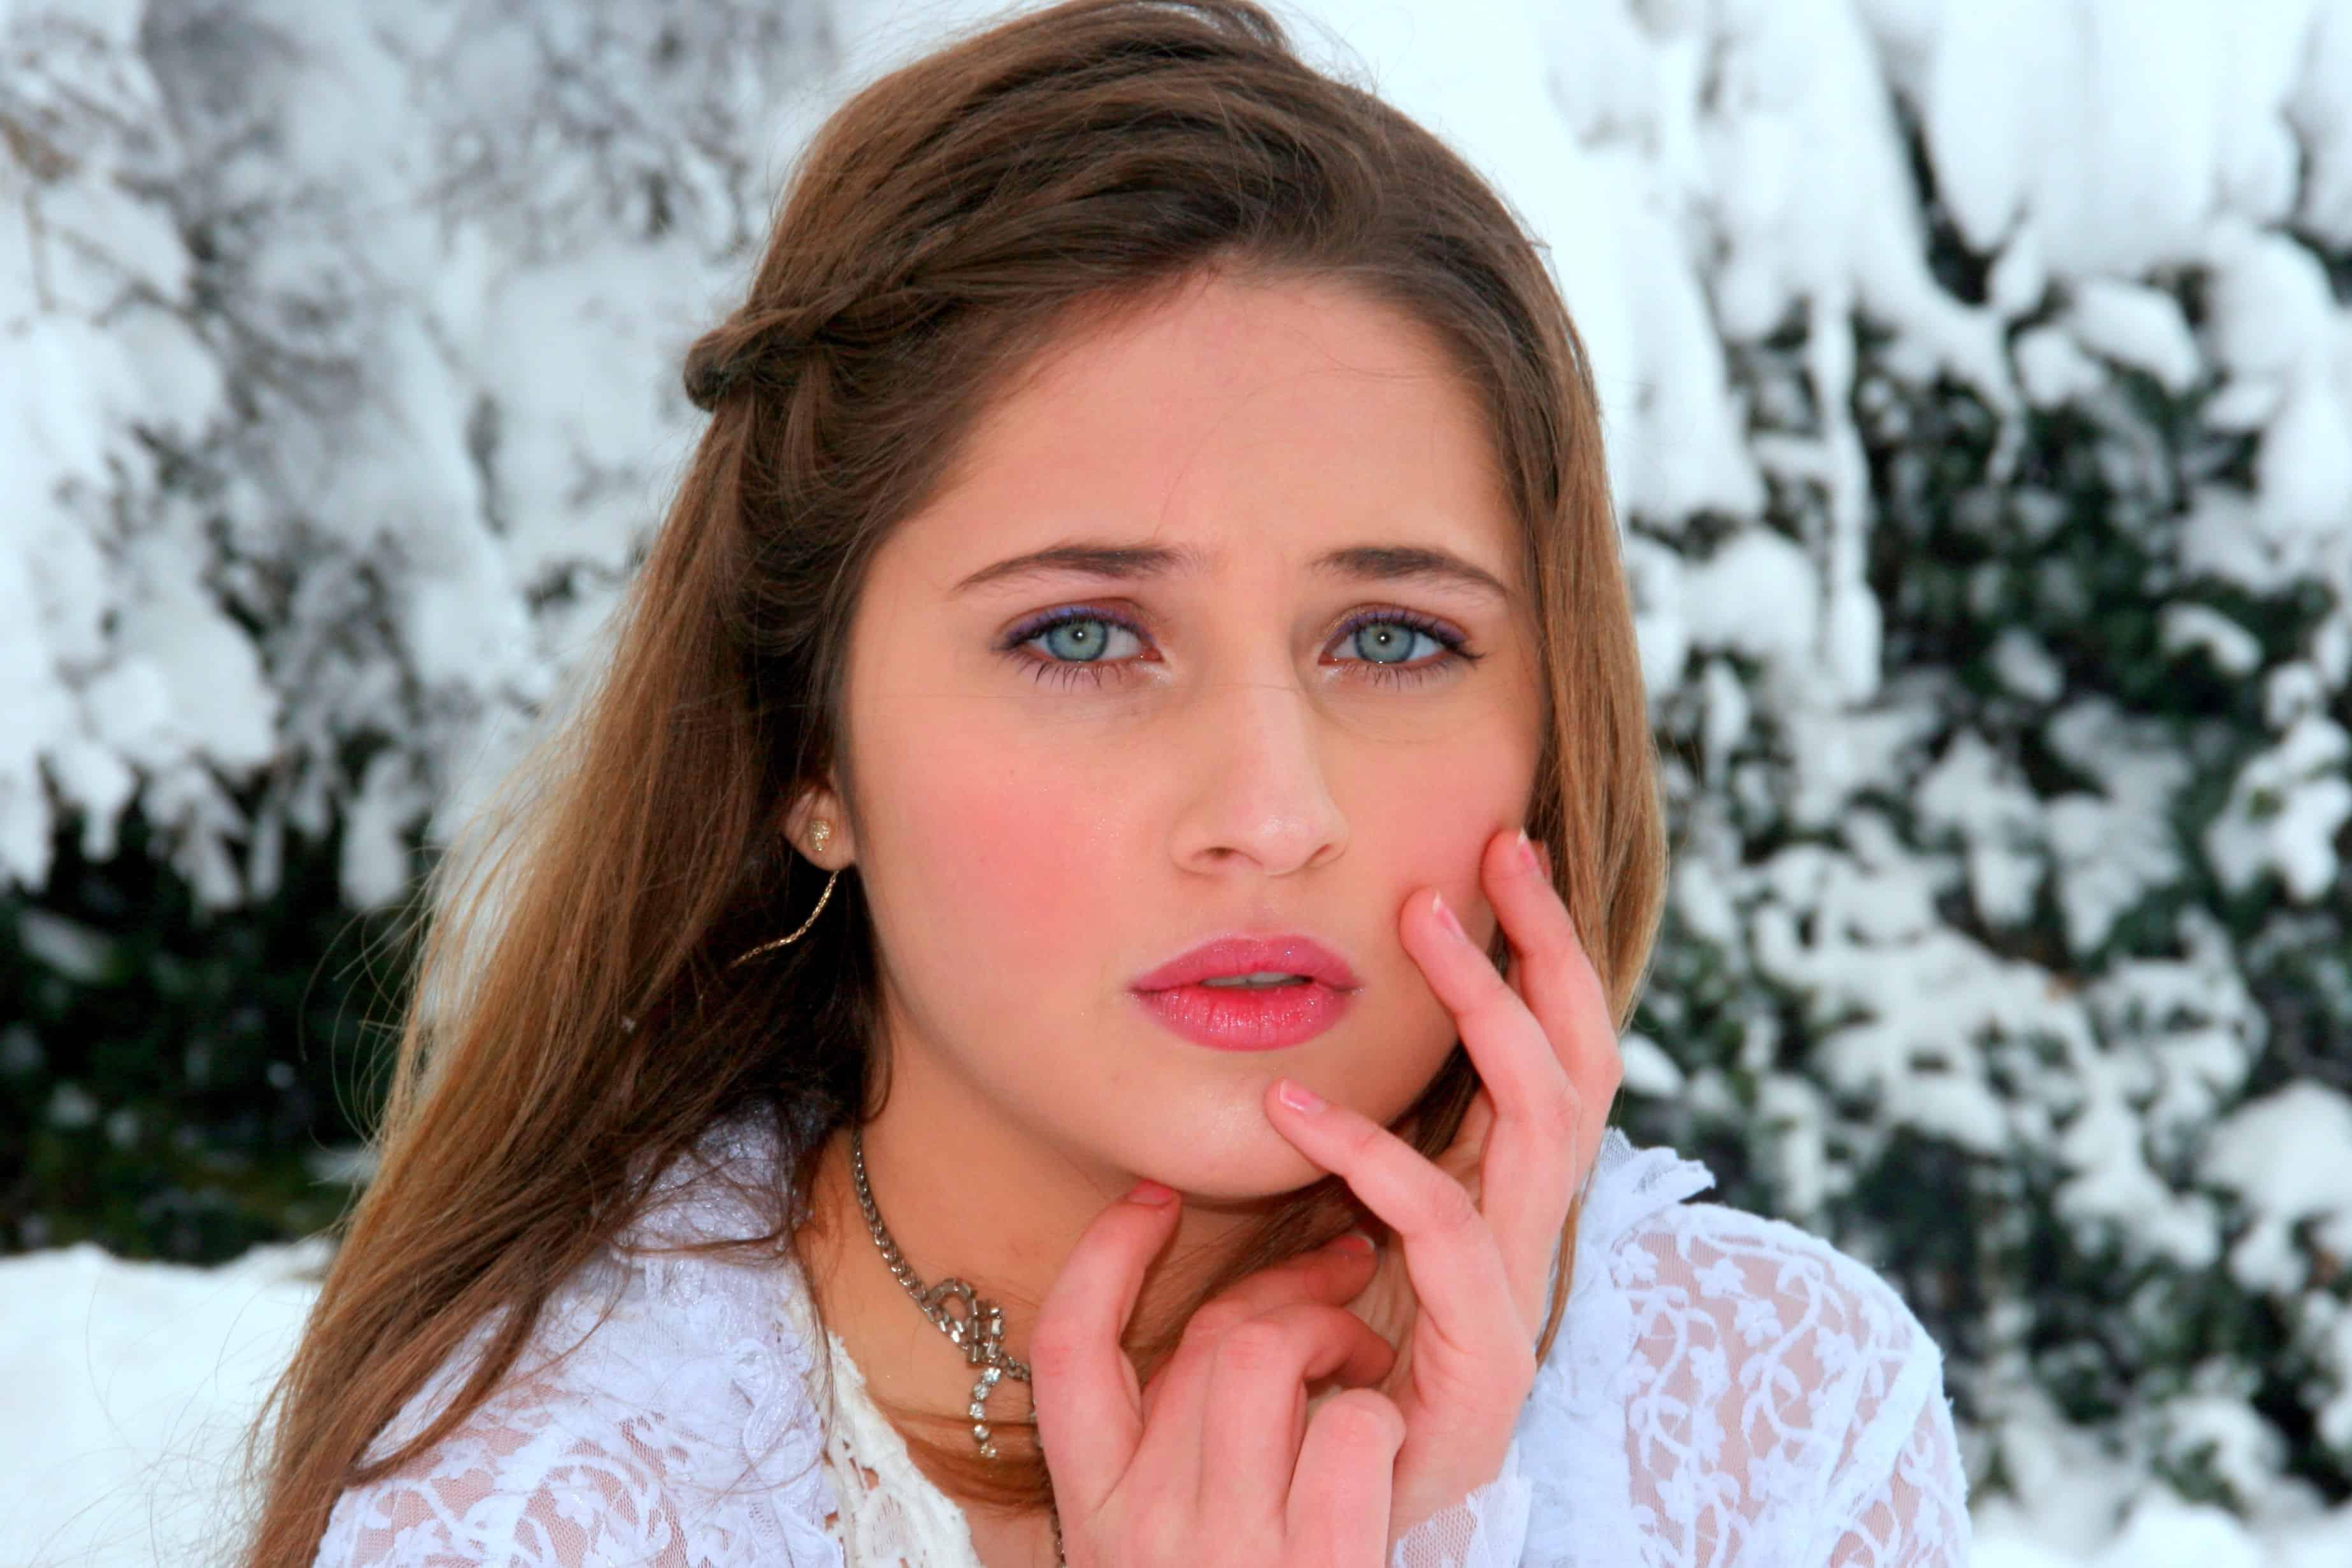 image libre  v u00eatements  femme  superbe  rouge  u00e0 l u00e8vres  maquillage  portrait  joli  visage